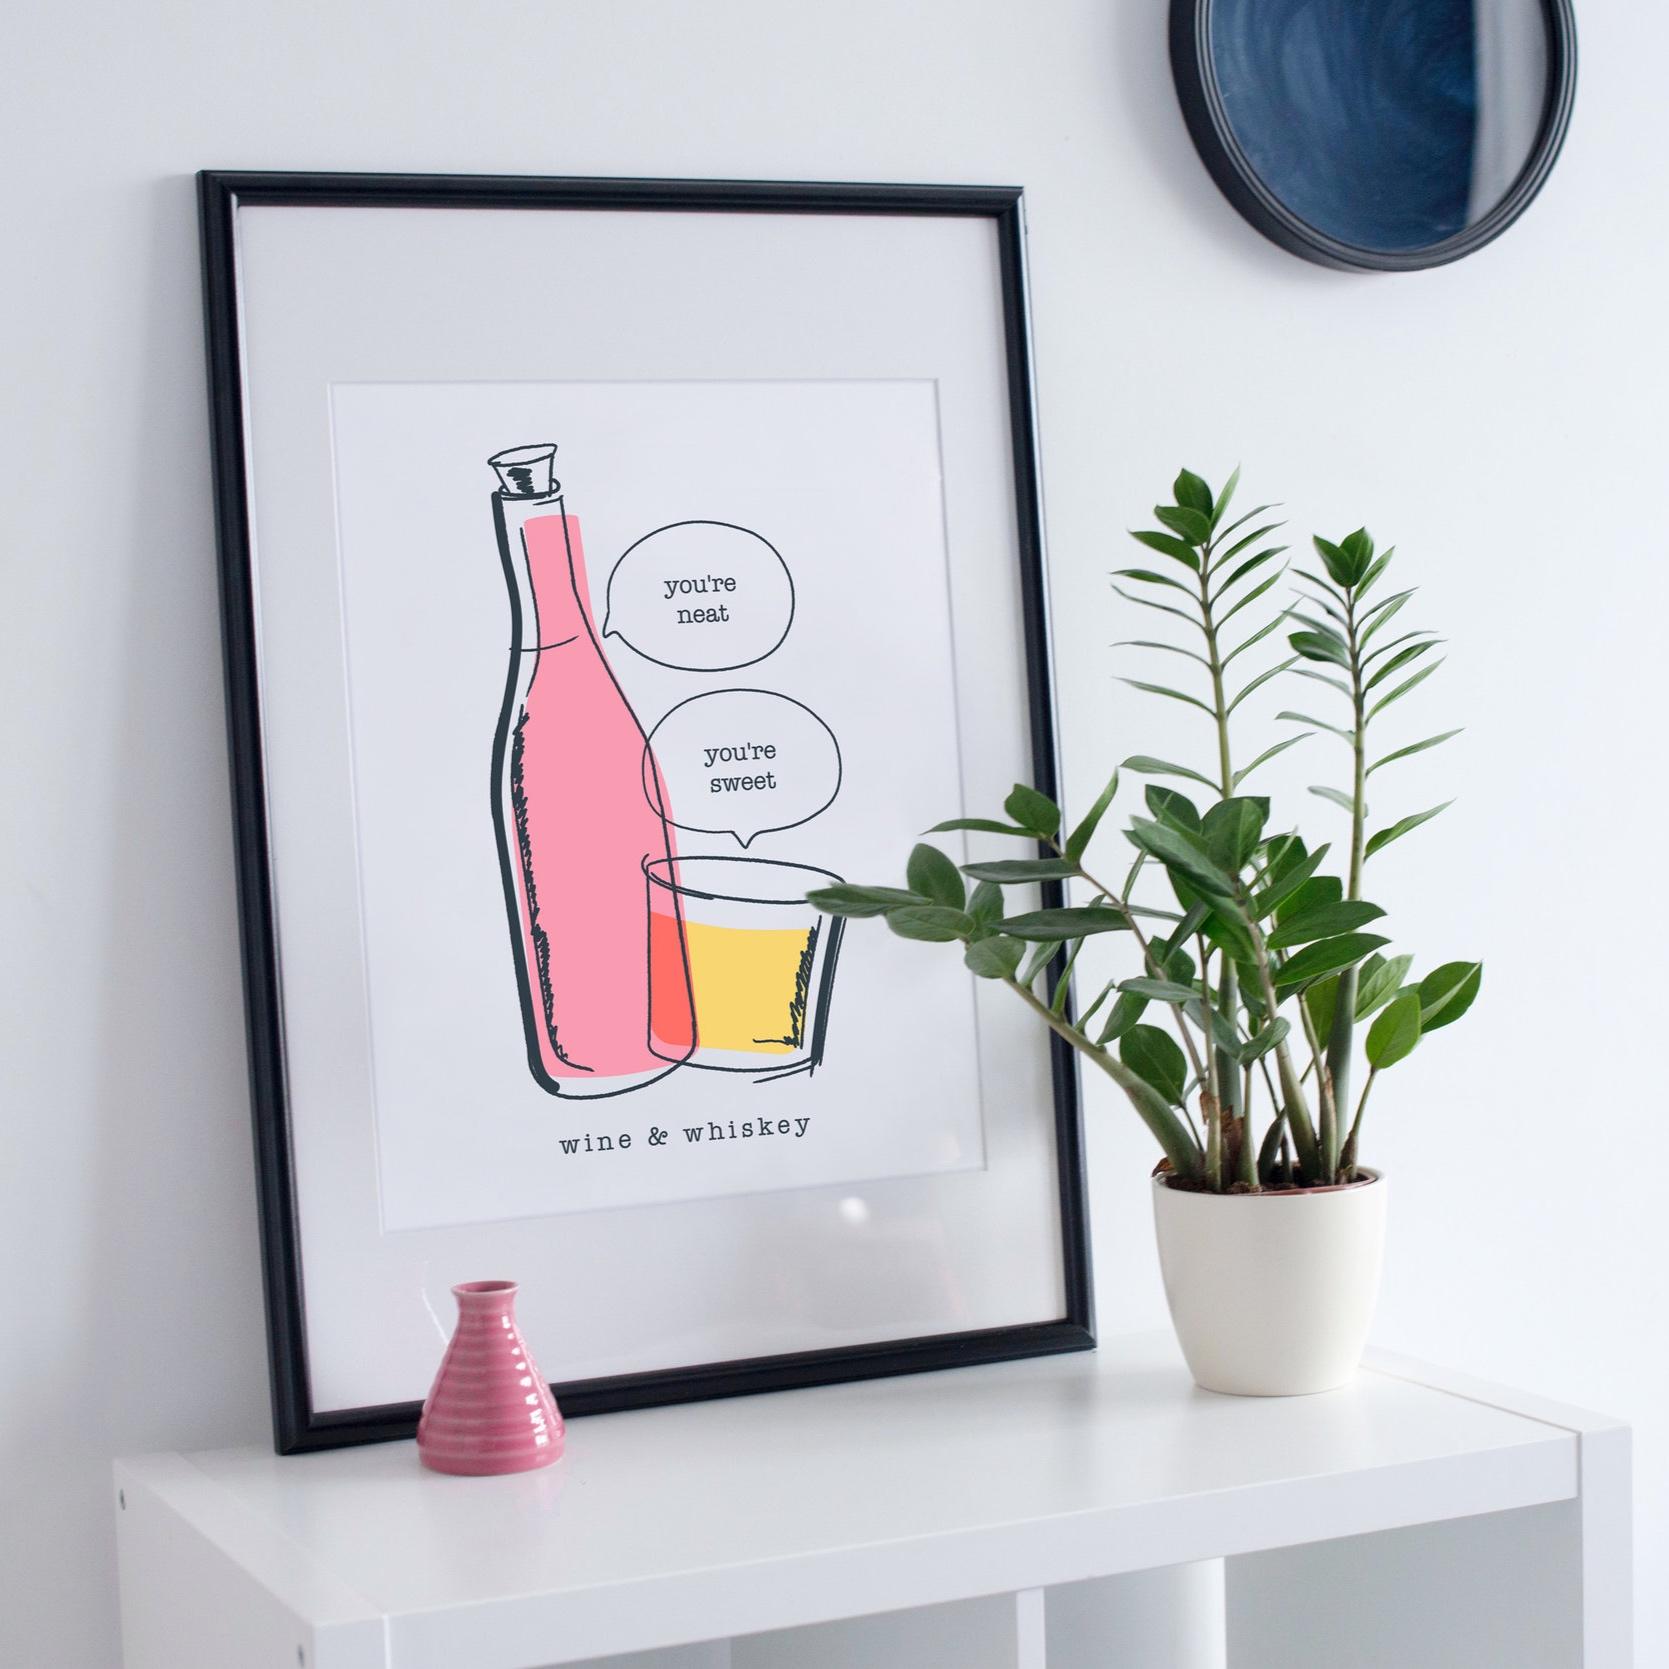 wine-and-whiskey.jpg